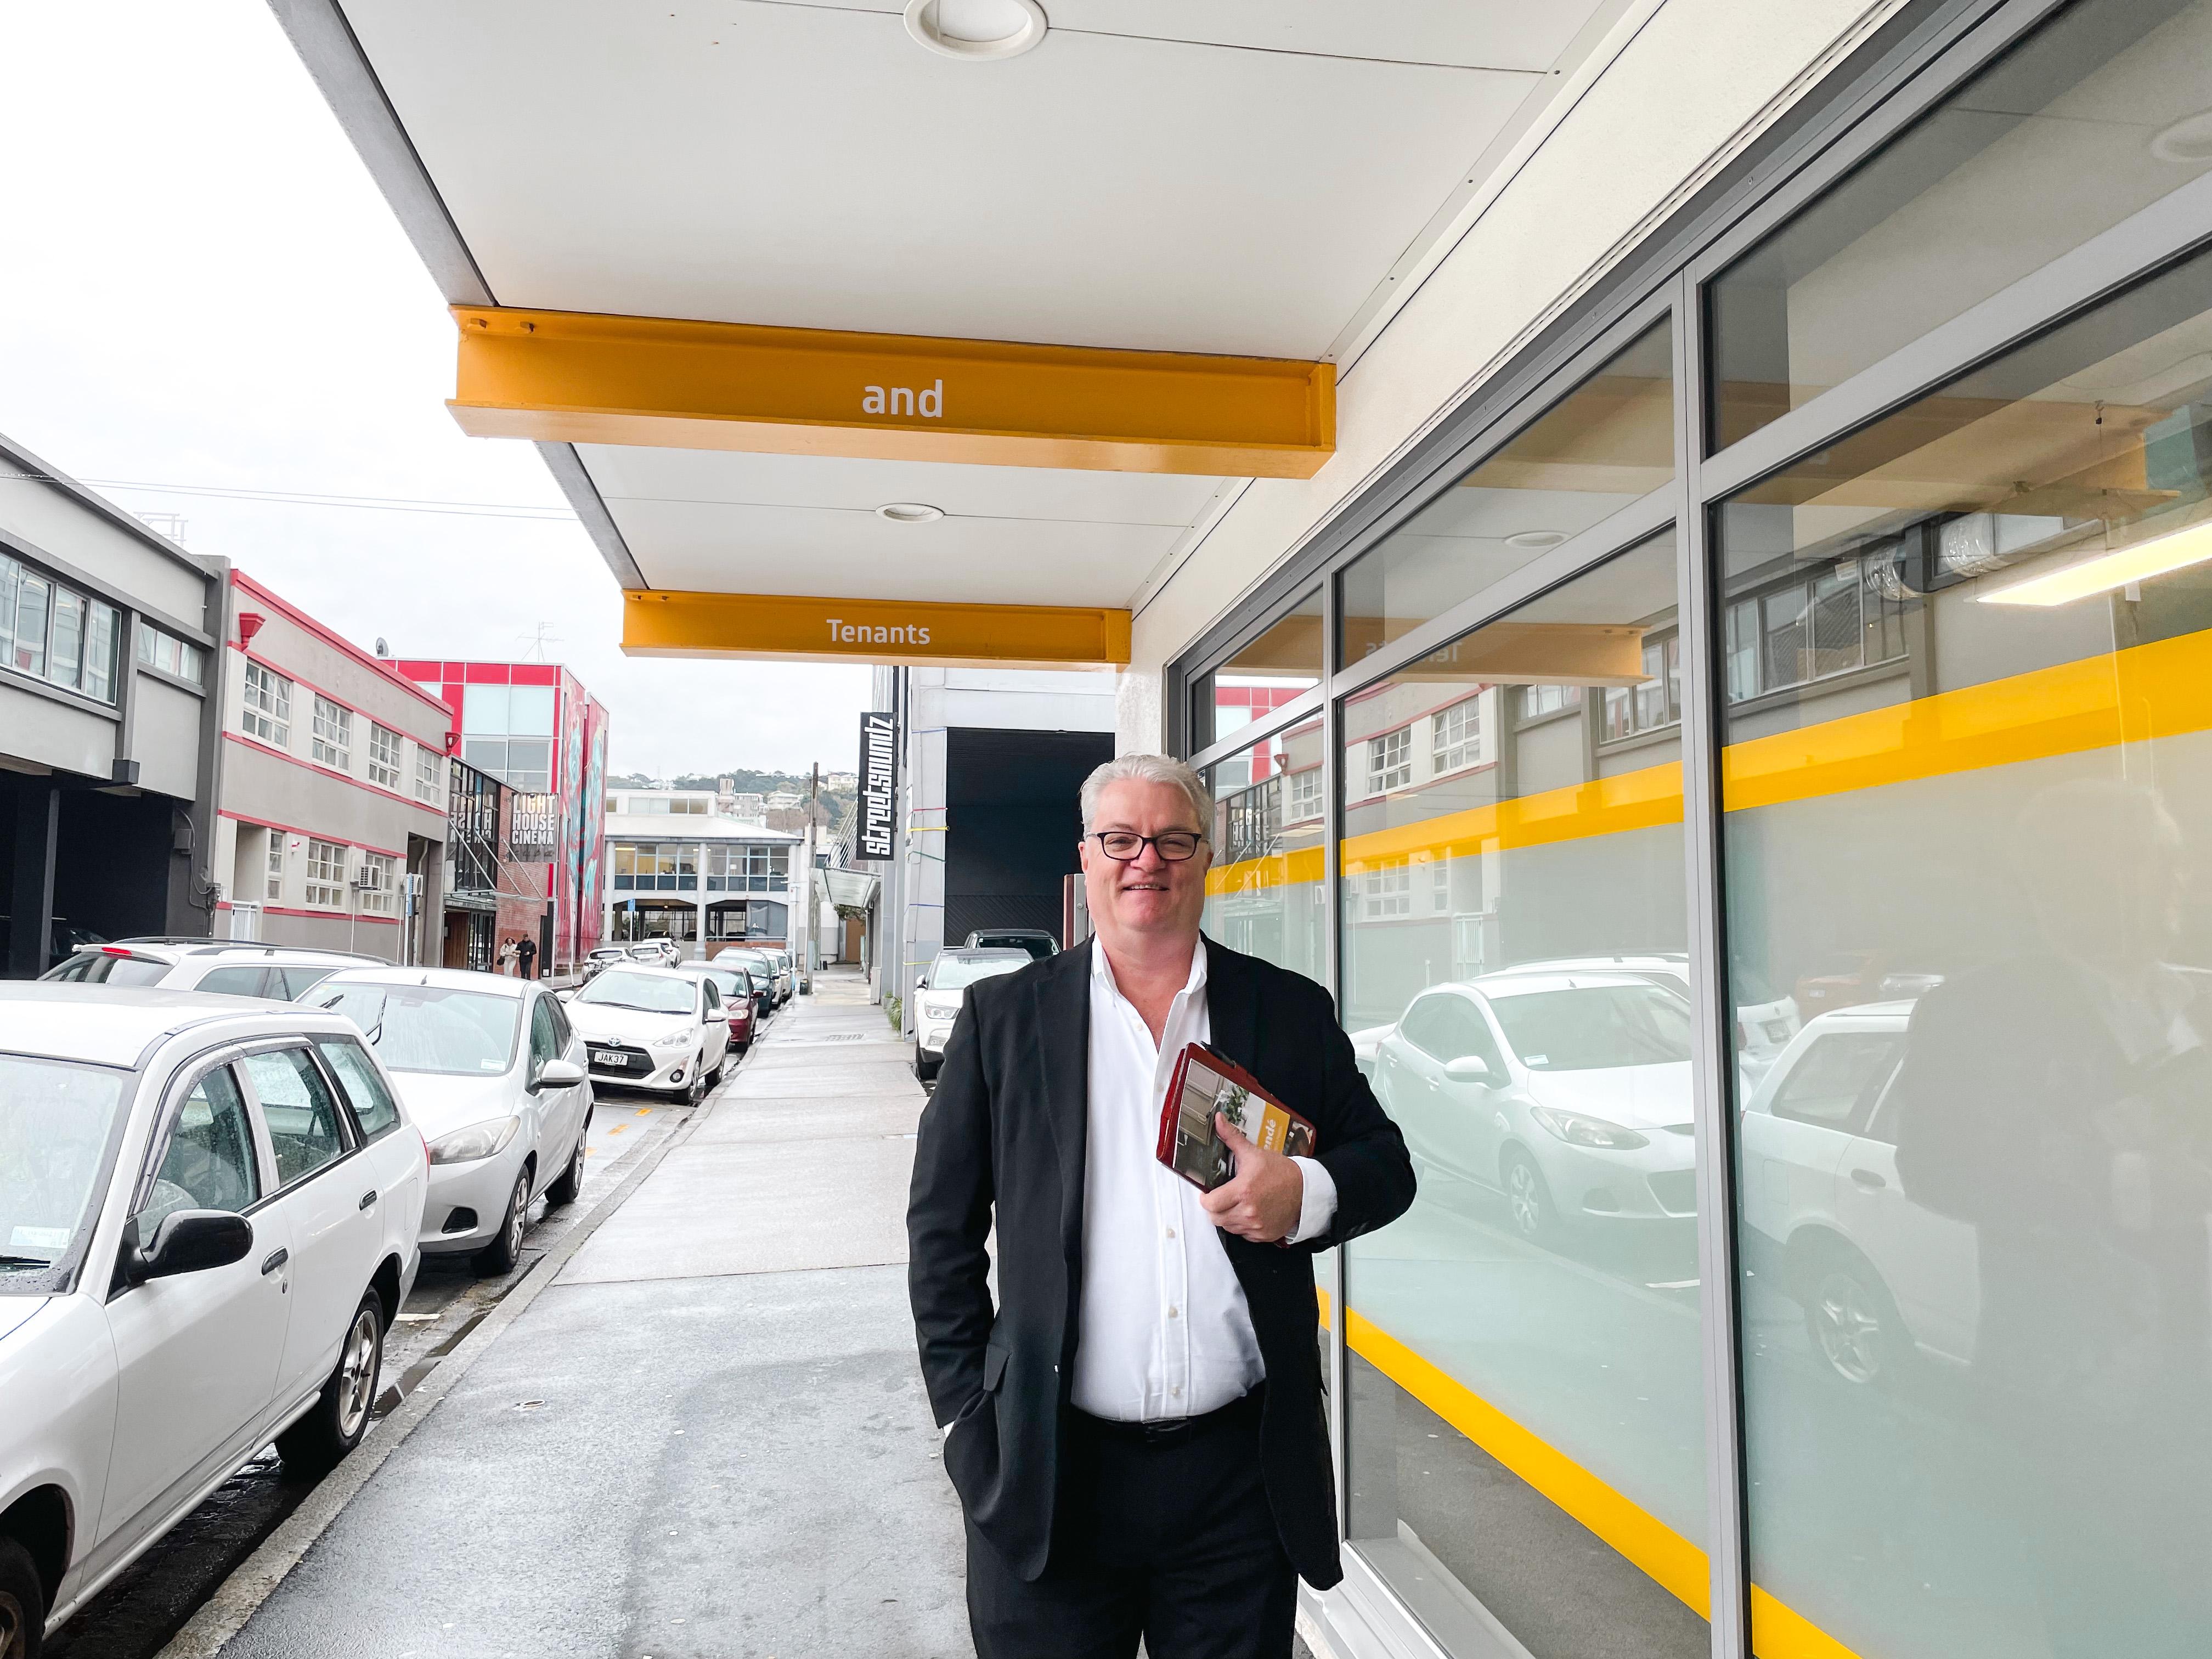 Grant Foggo from Comprendé Property Management Wellington